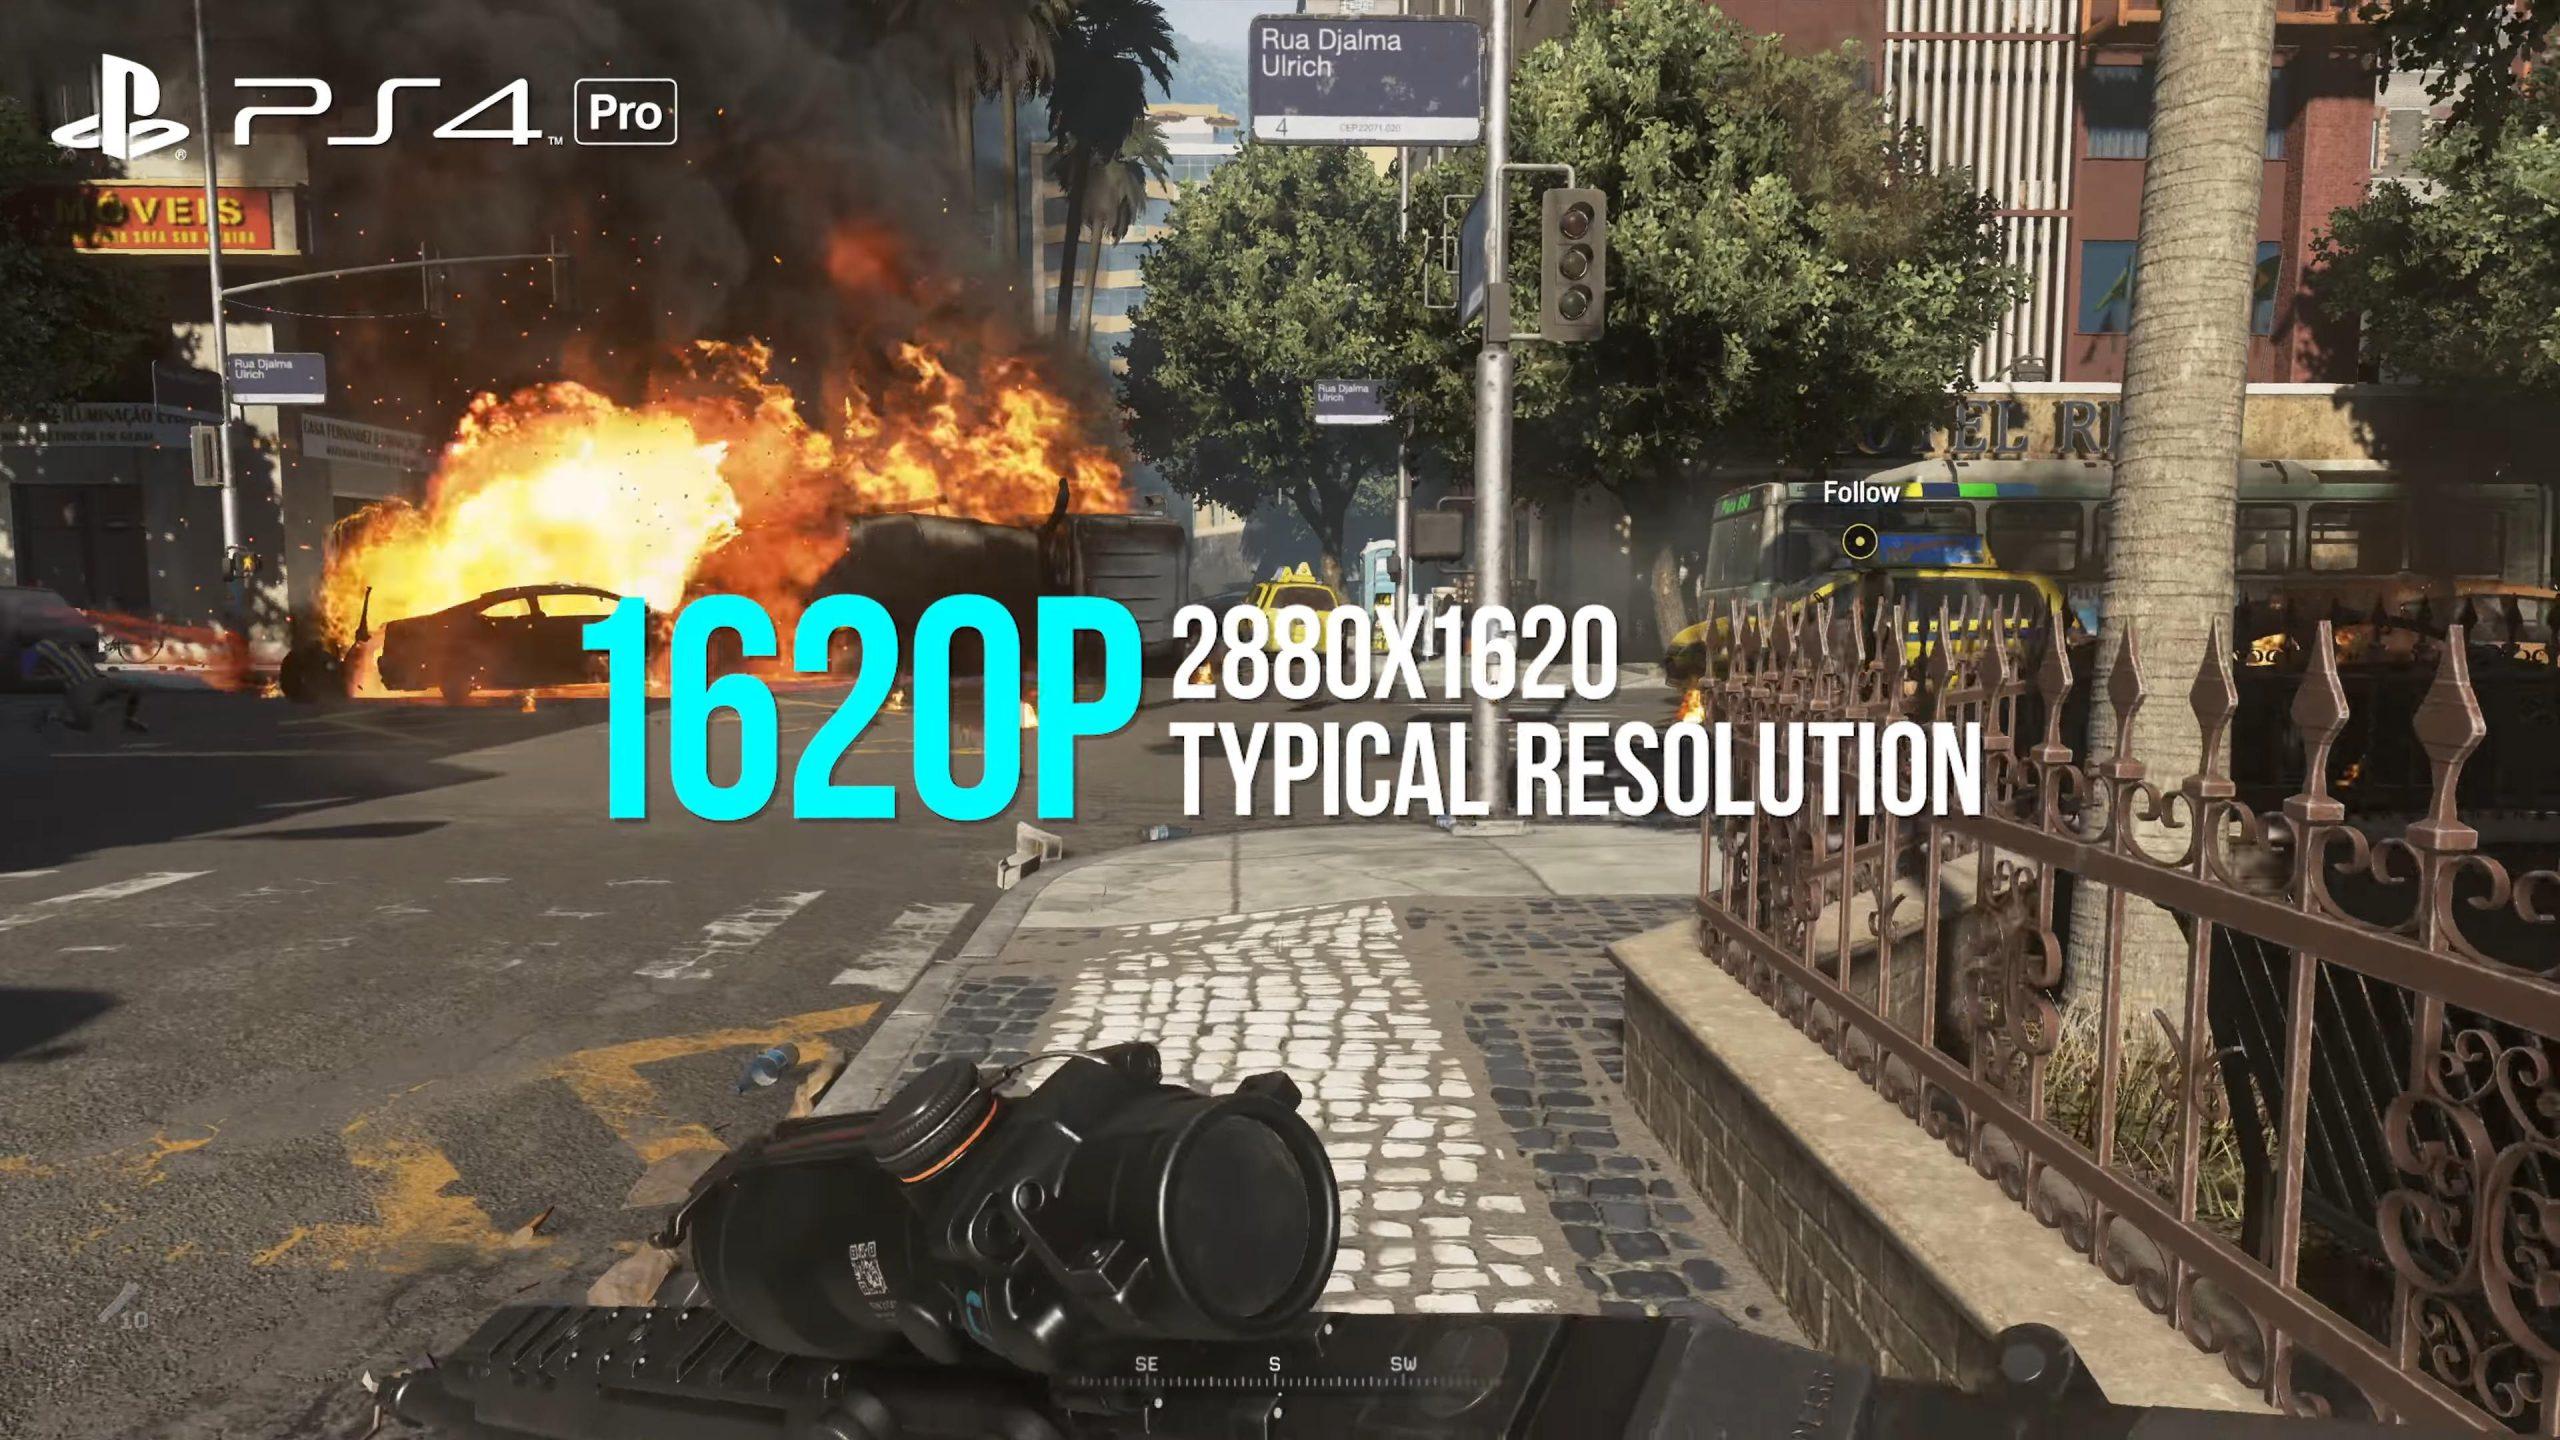 kPdmORm scaled - 「CoD:MW2リマスター」Xbox One X版をPS4 Proと全く同じグラフィックにしてしまい、メディアから酷評